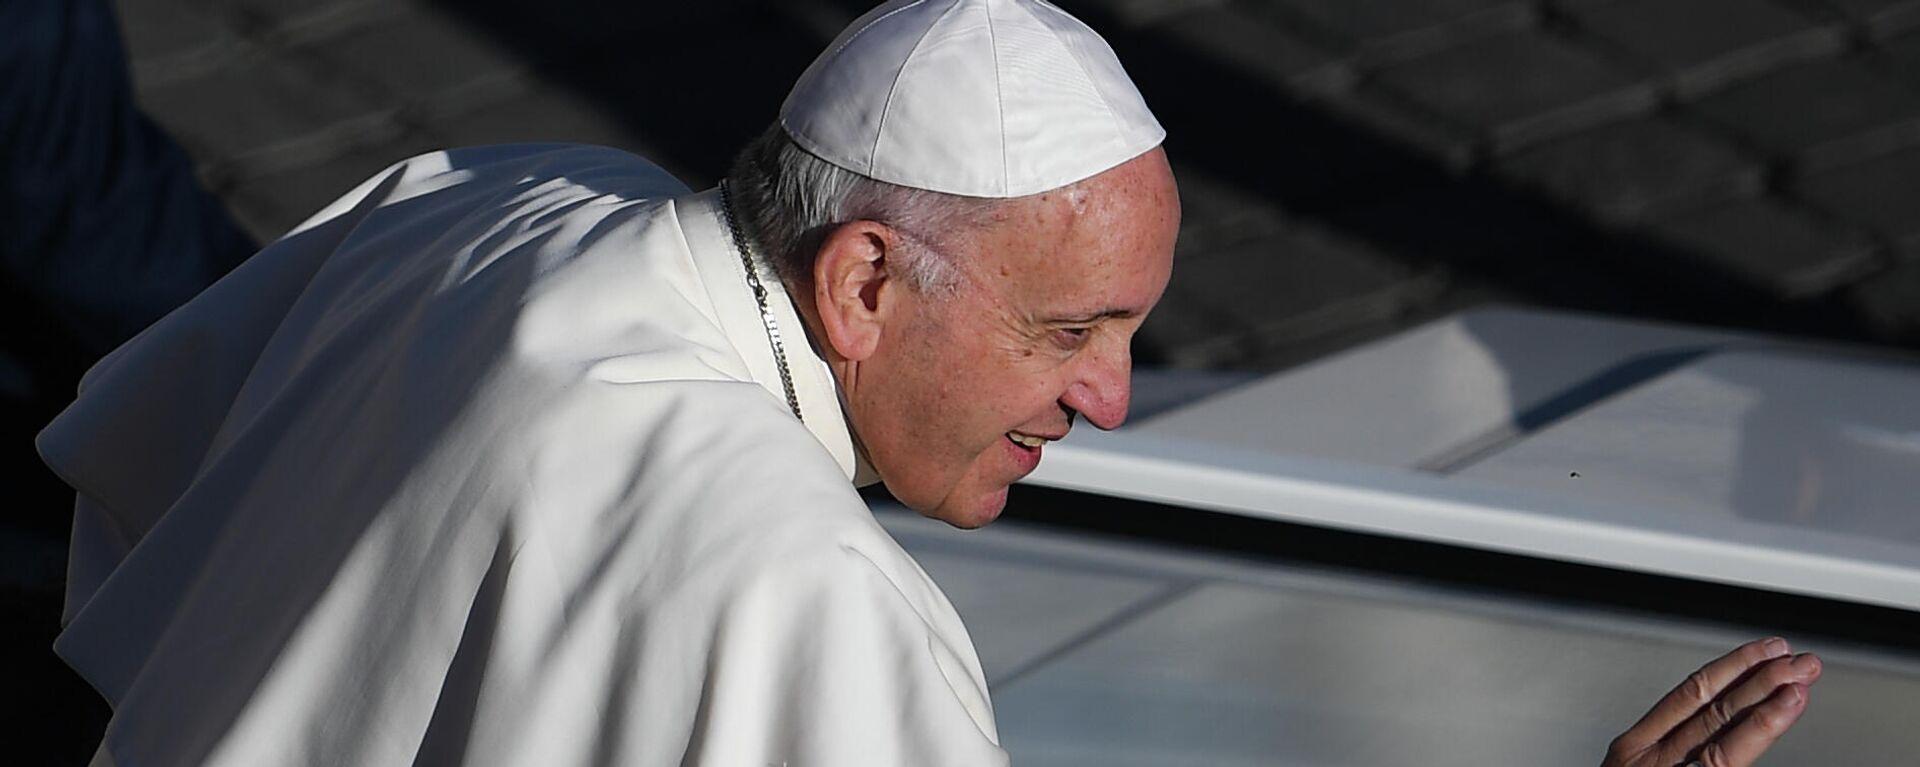 Papa Francesco - Sputnik Italia, 1920, 21.09.2021